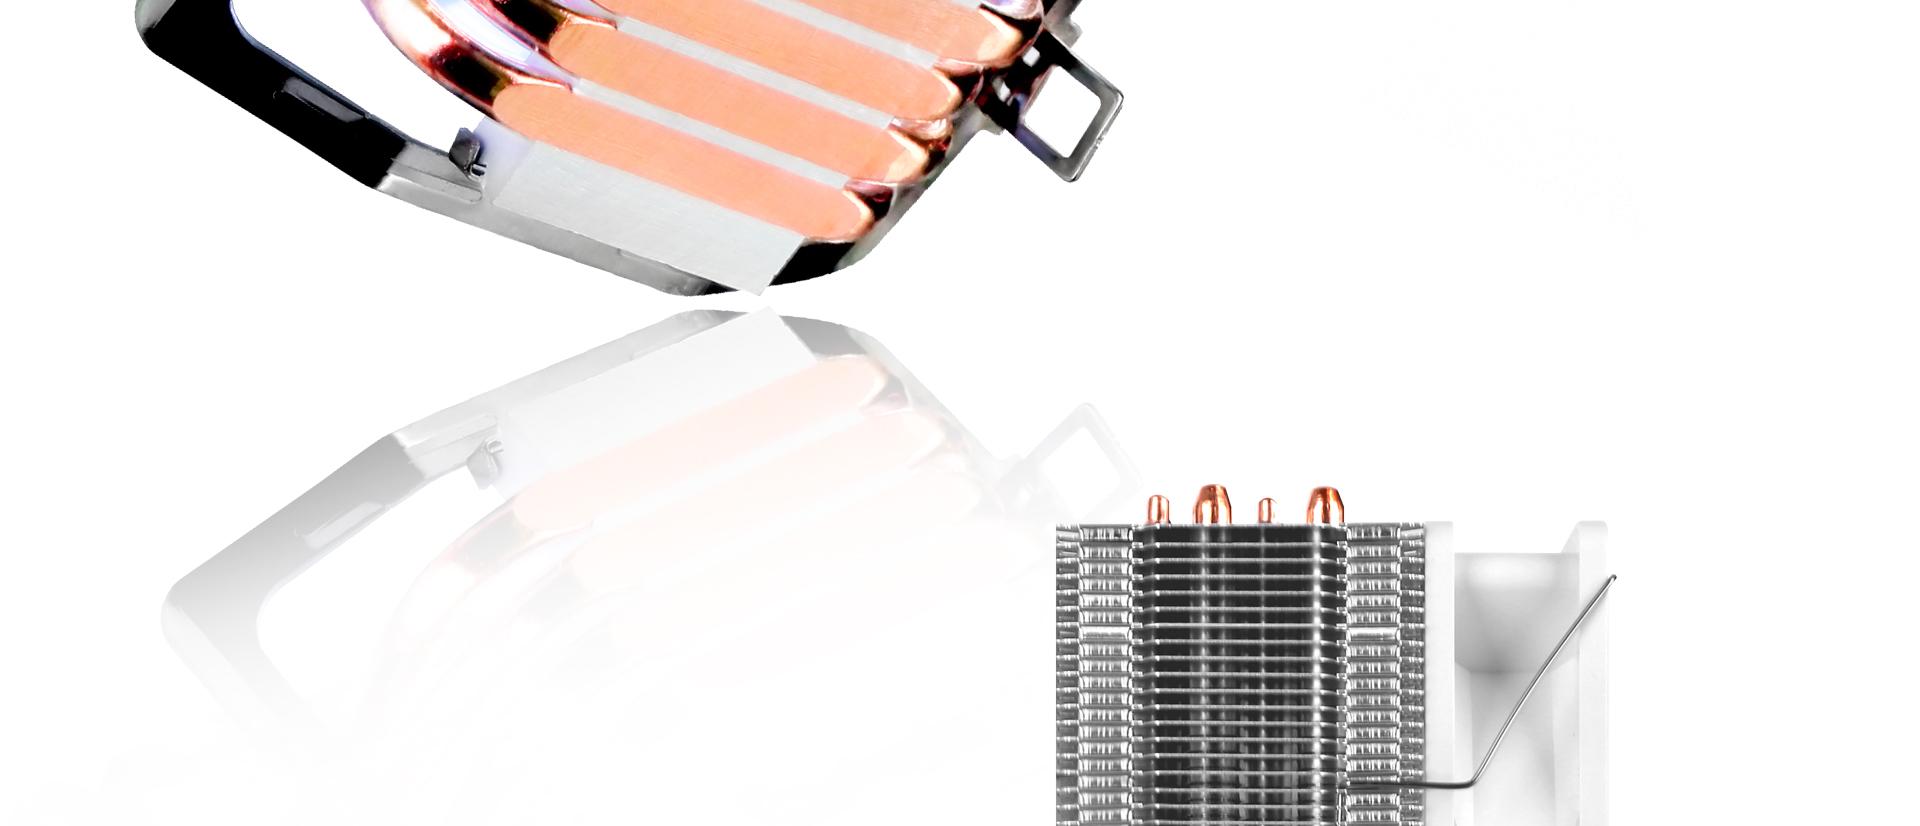 CPU Cooler T405 en color blanco descripción tubos de calor